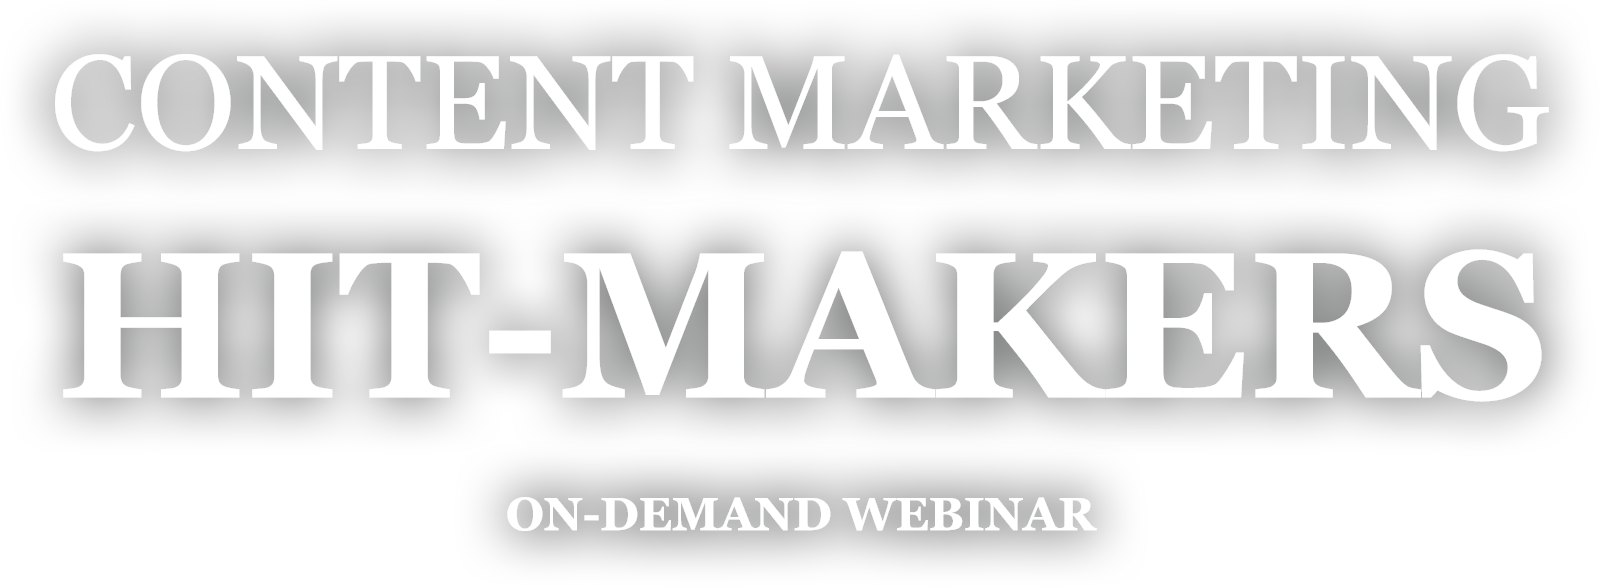 Content Marketing Hit-Makers - On-demand Webinar